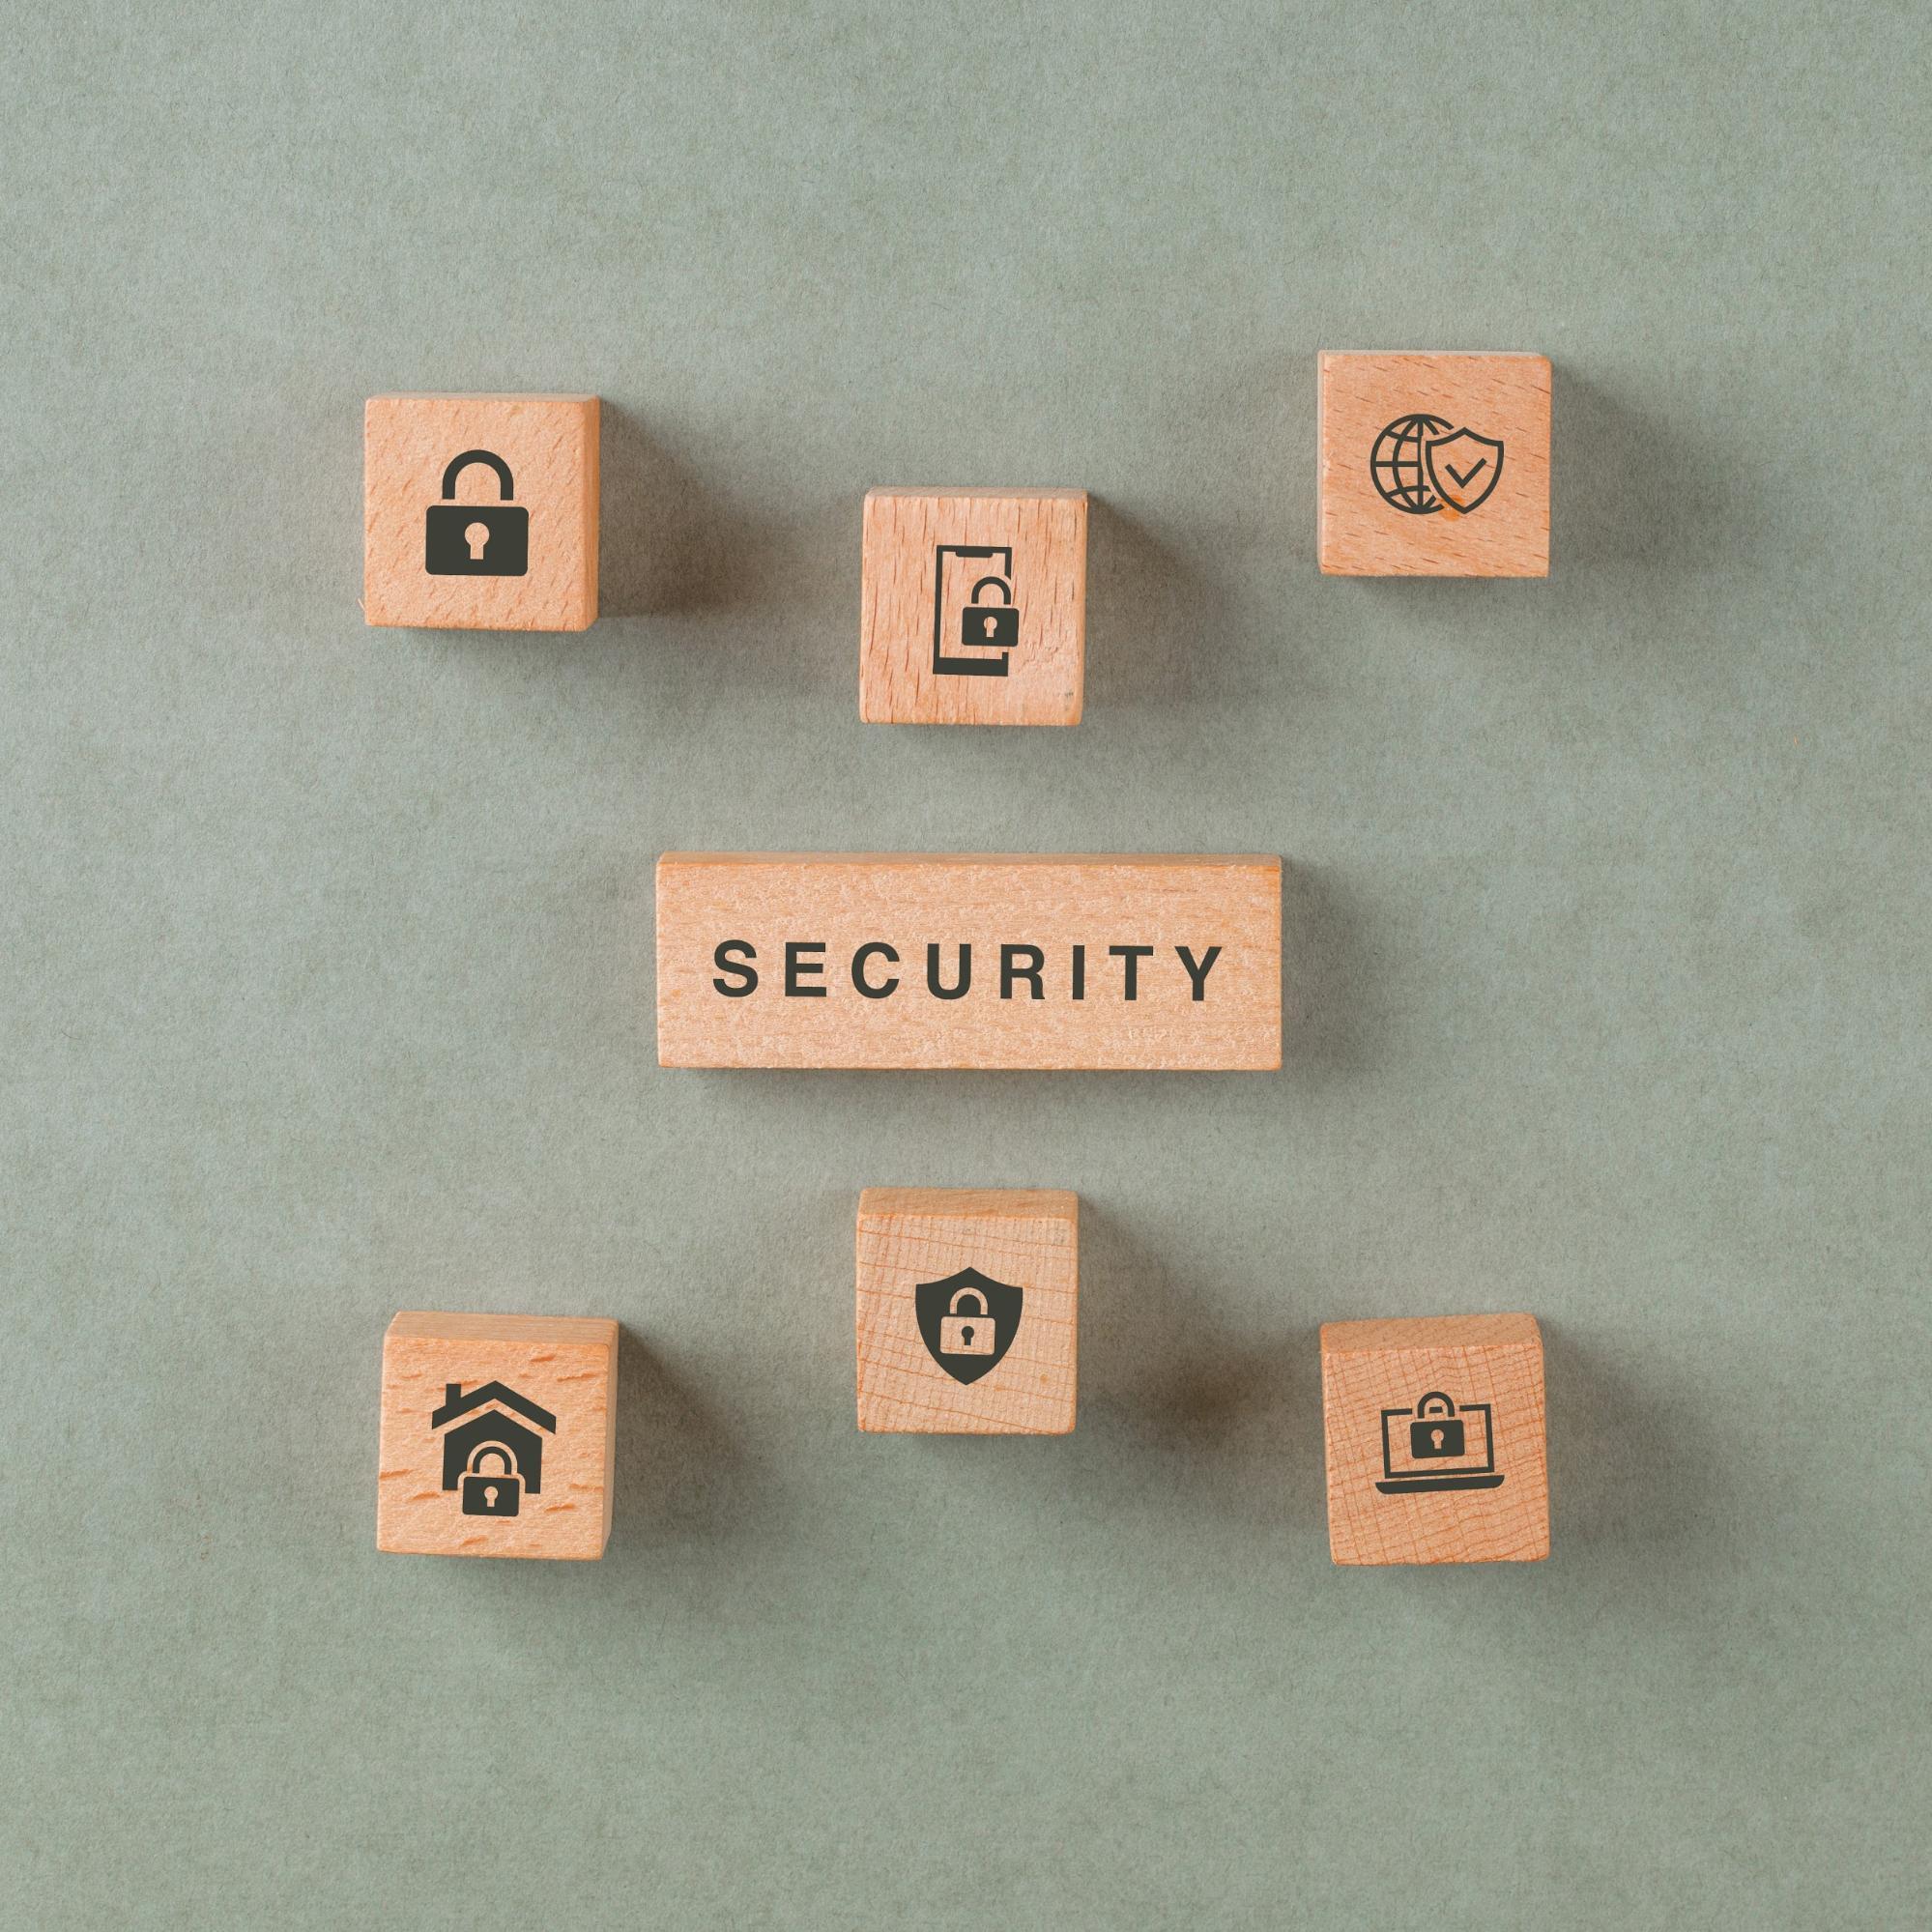 5 Best Ways To Make Online Examinations Secure? | Parakh Online Pvt. Ltd.